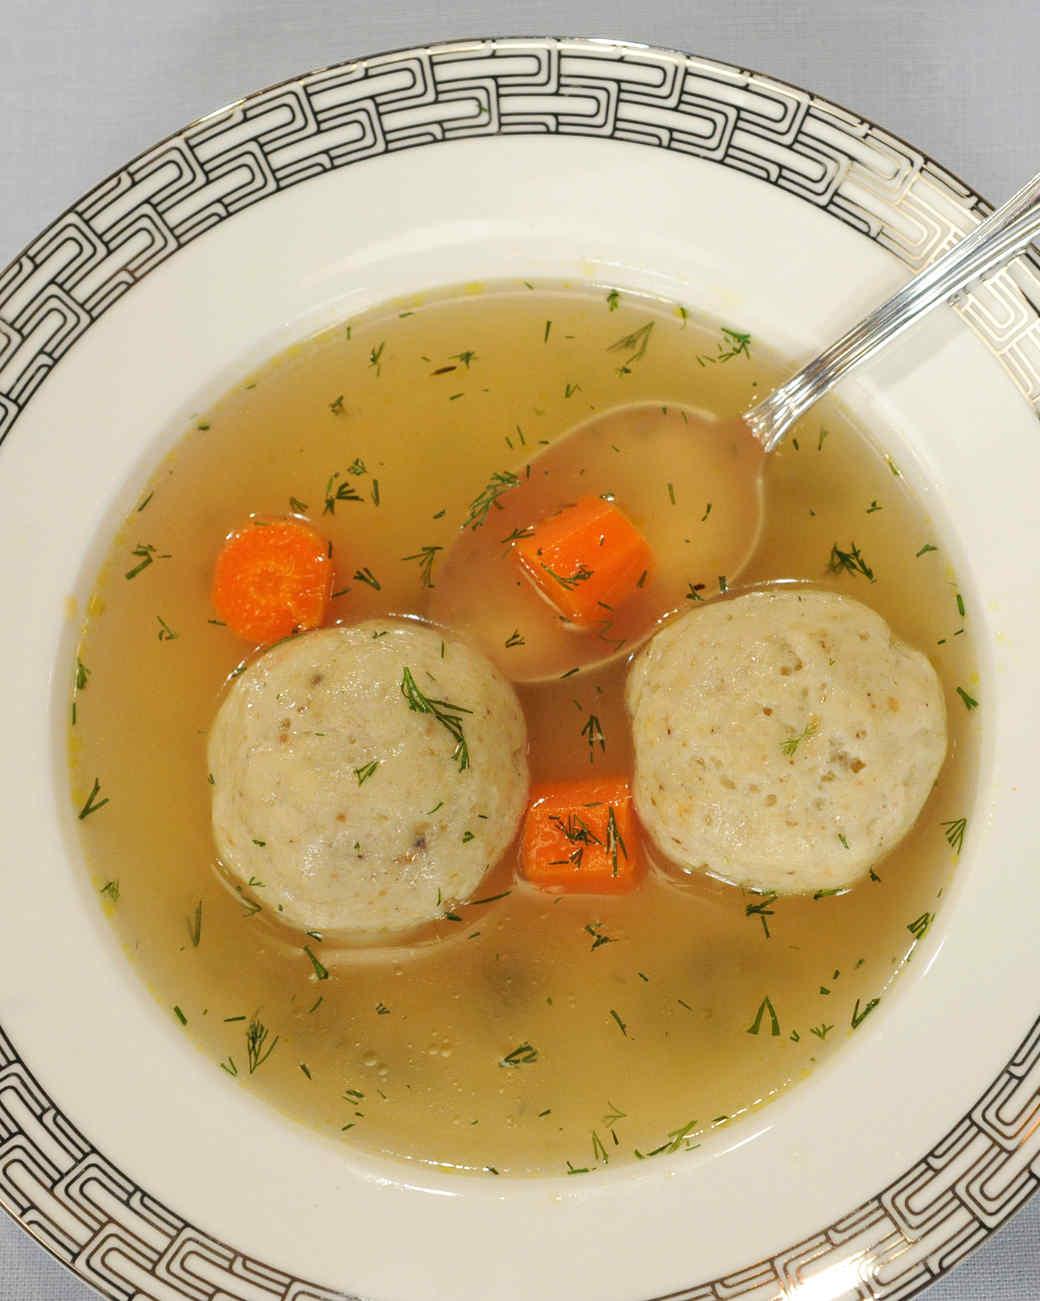 ball soup vegan matzo ball soup was vegan matzo ball soup with photo ...